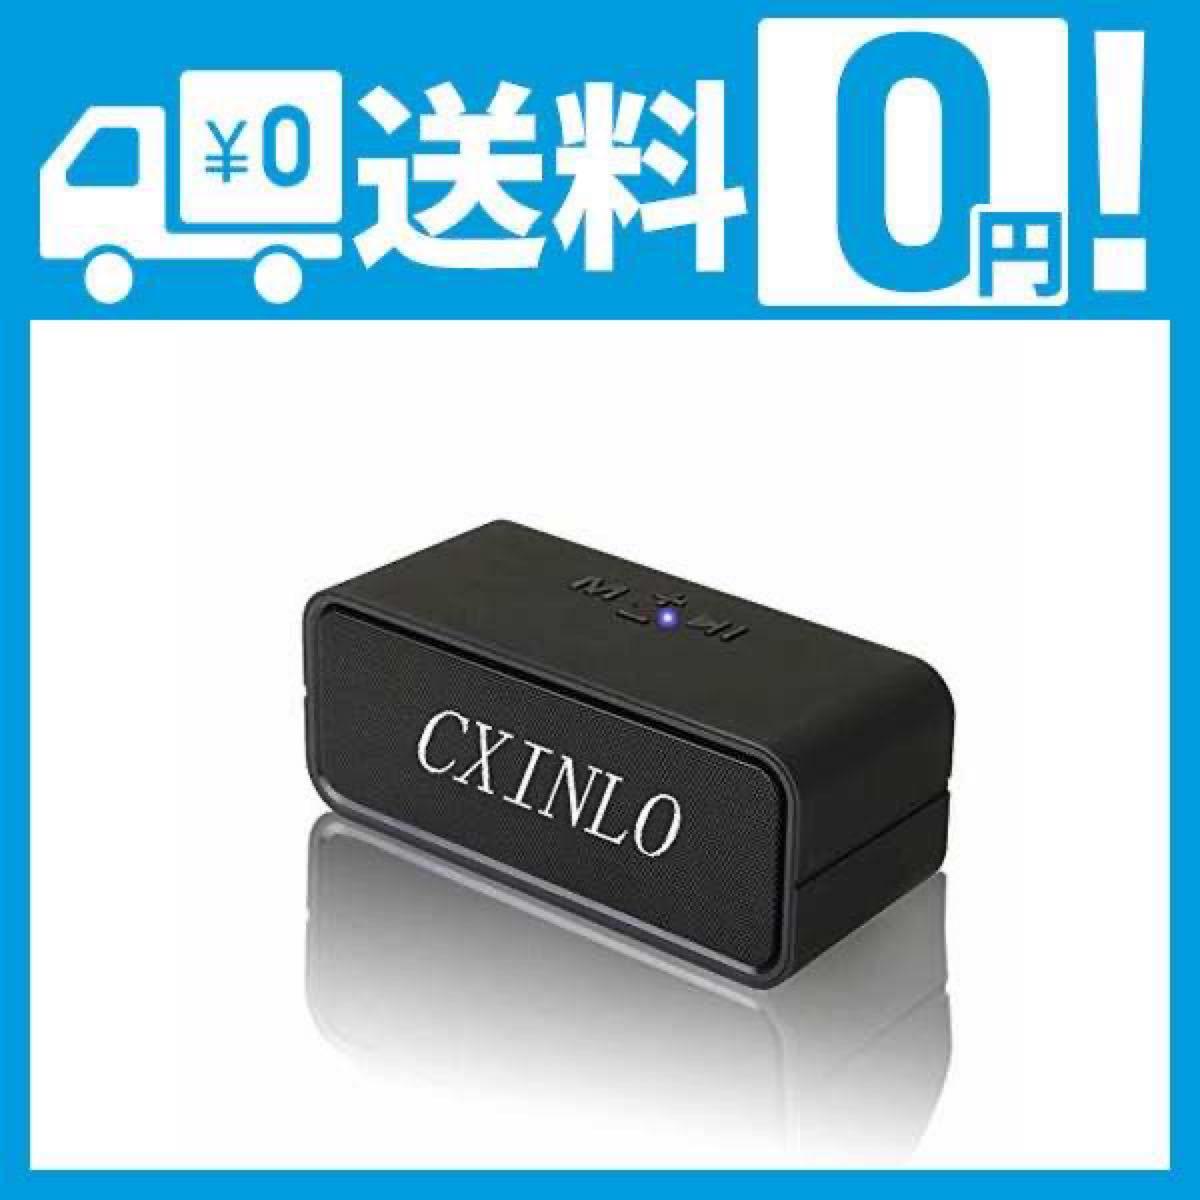 Bluetooth 5.0 スピーカー ワイヤレス 高音質 低起動音 4種再生方式 大音量 マイク搭載 ポータブル